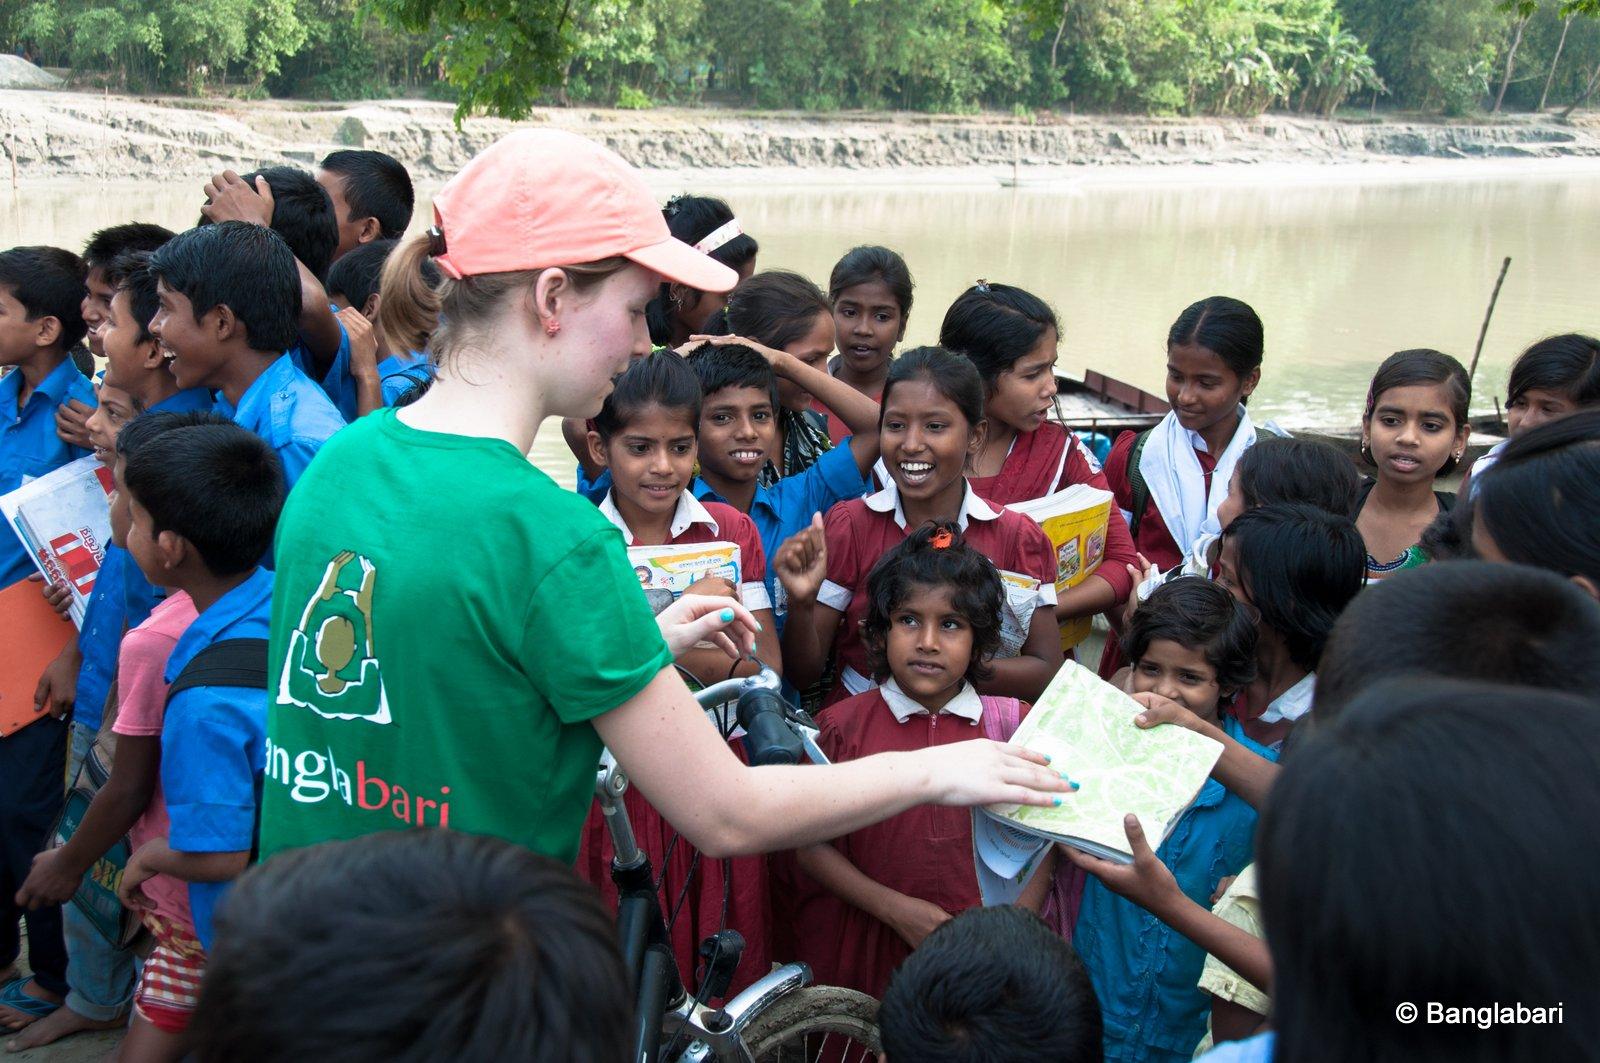 bangladesh2015_0416